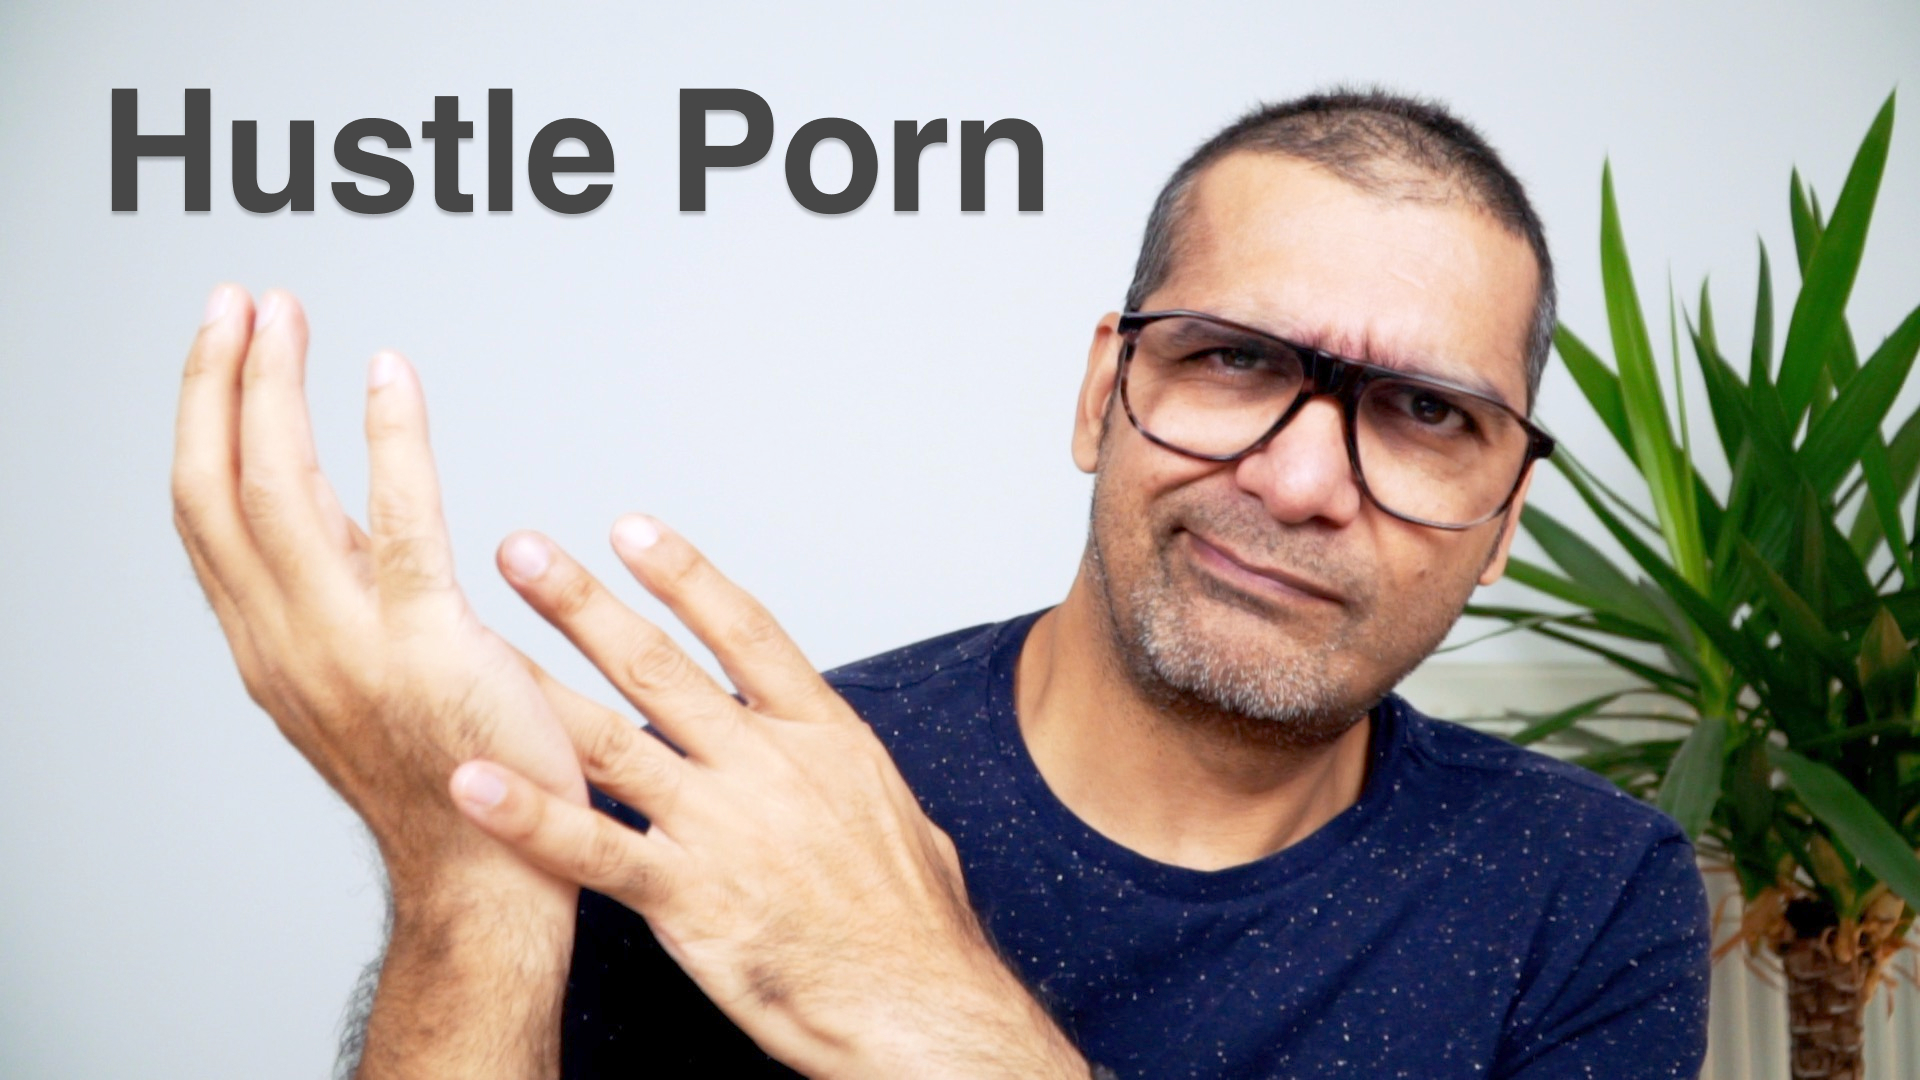 Hustle Porn